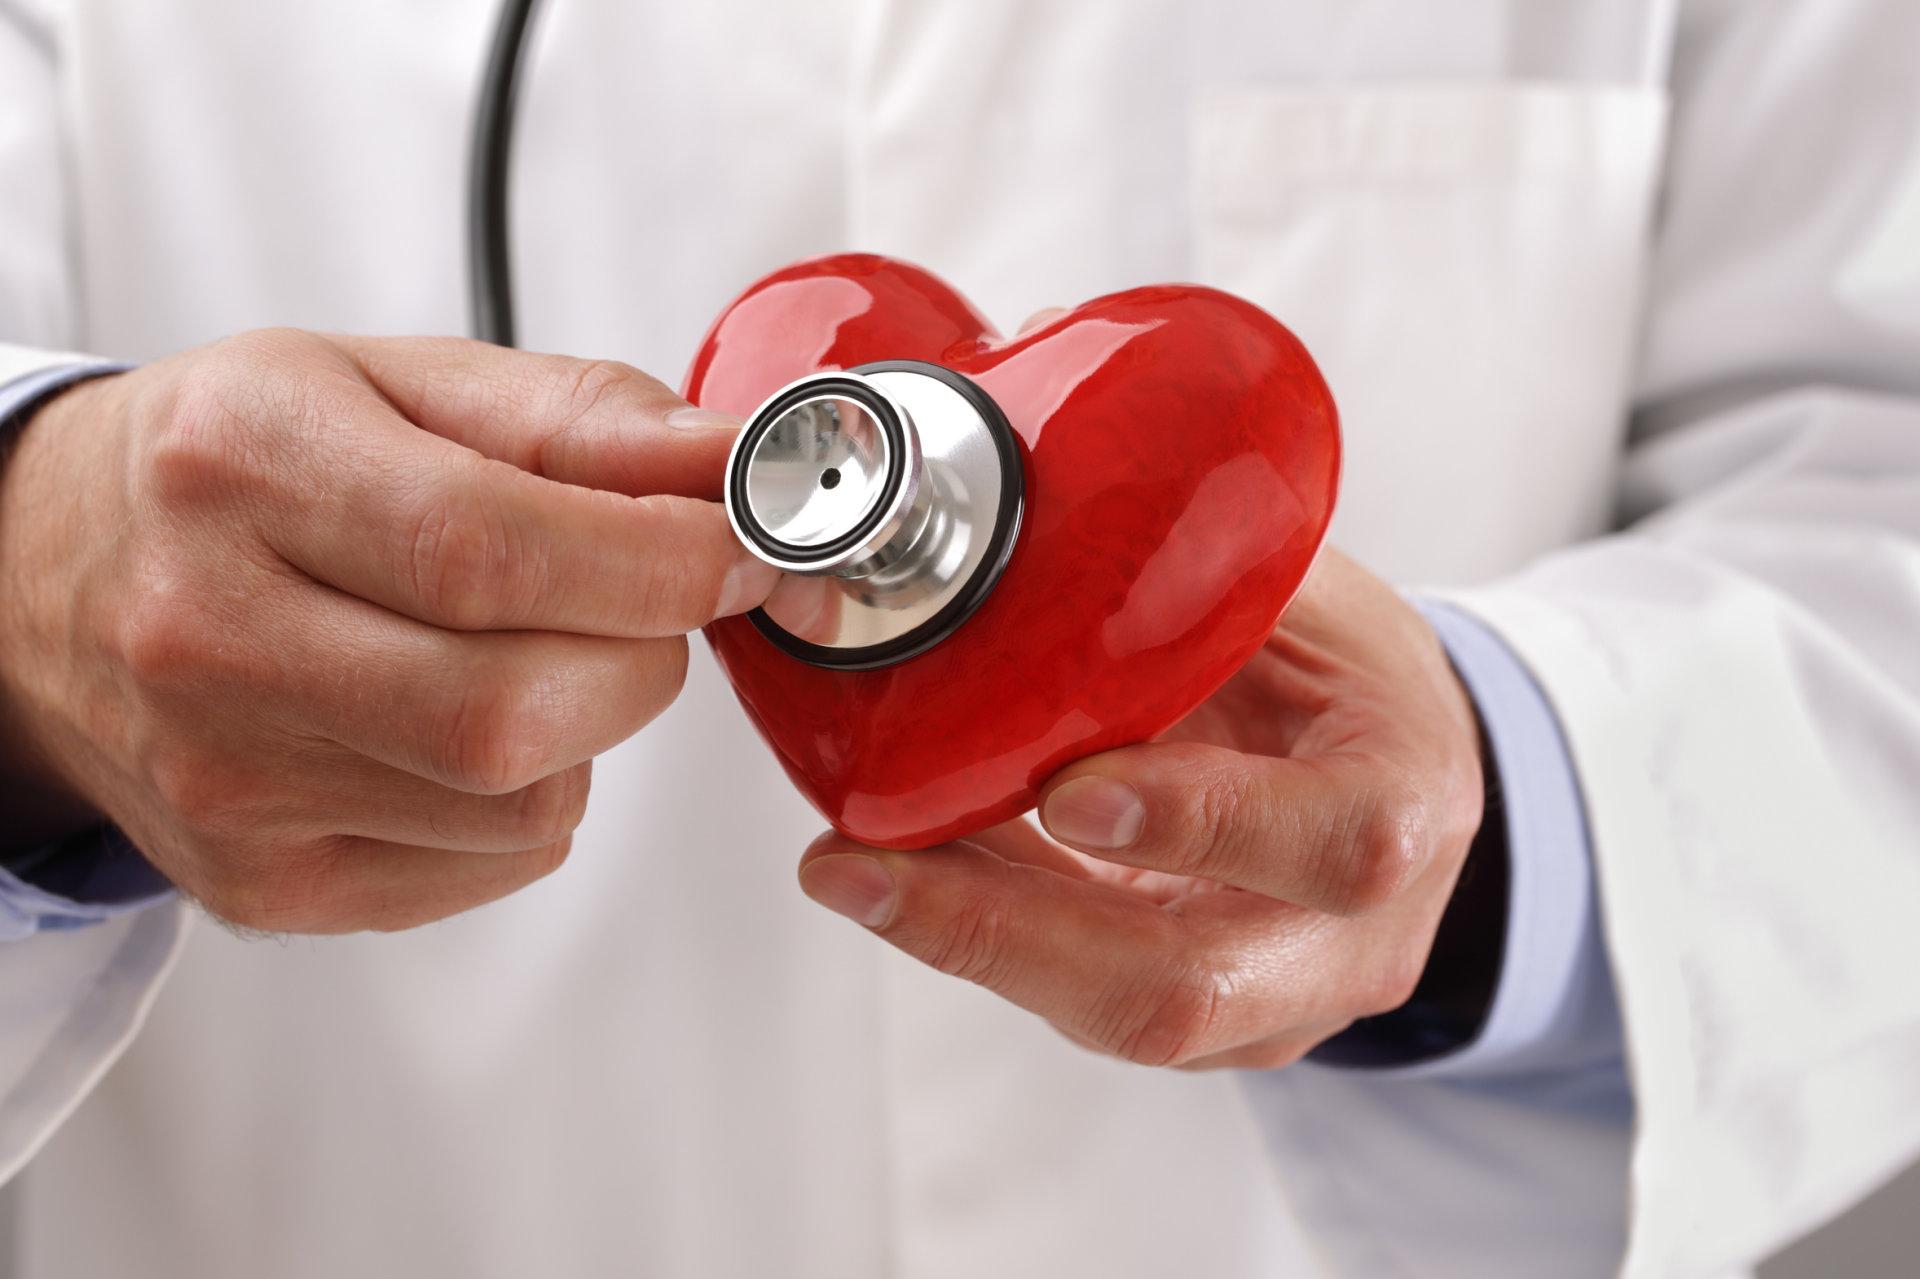 ar galima gerti vandenį su hipertenzija medicininė hipertenzija